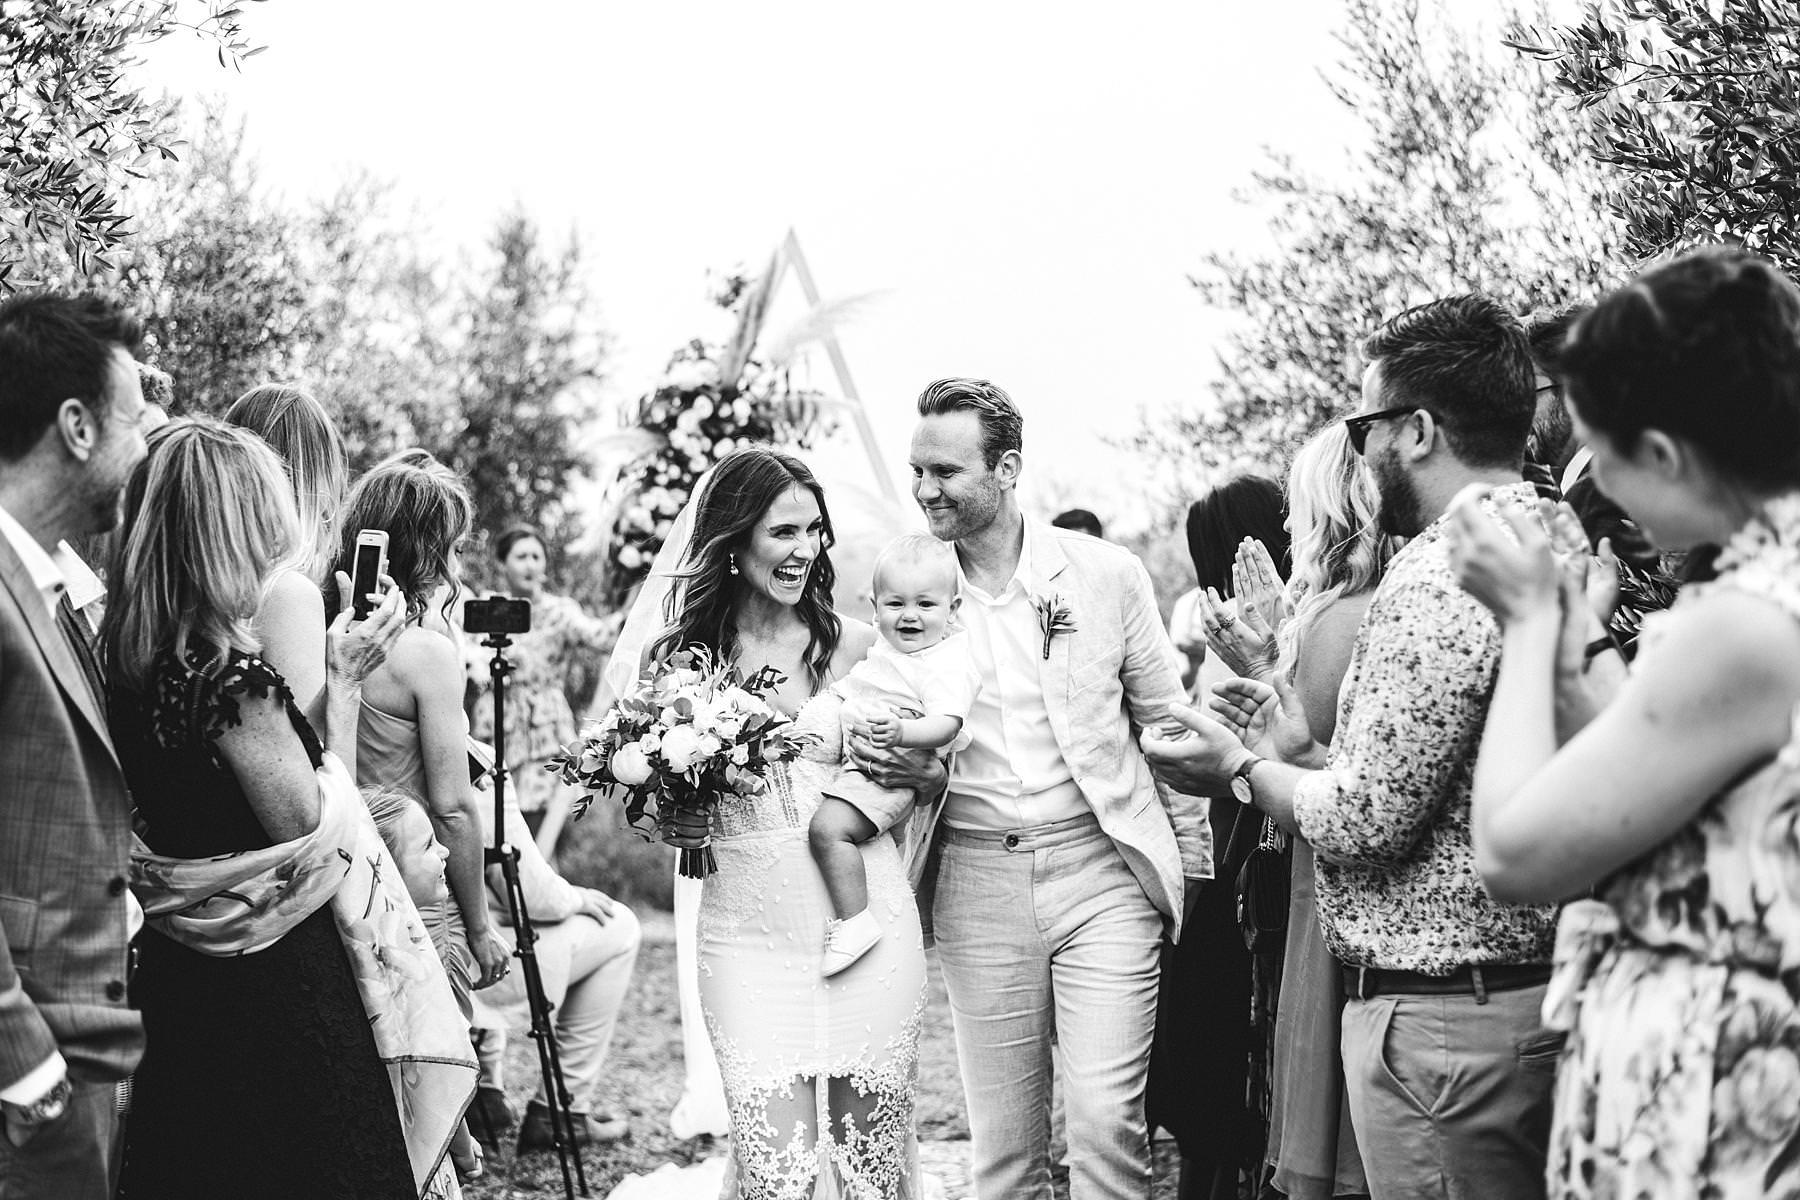 Georgie and Patrick's unusual wedding in Tuscany at Villa Il Poggiale, a stunning venue in the heart of Chianti